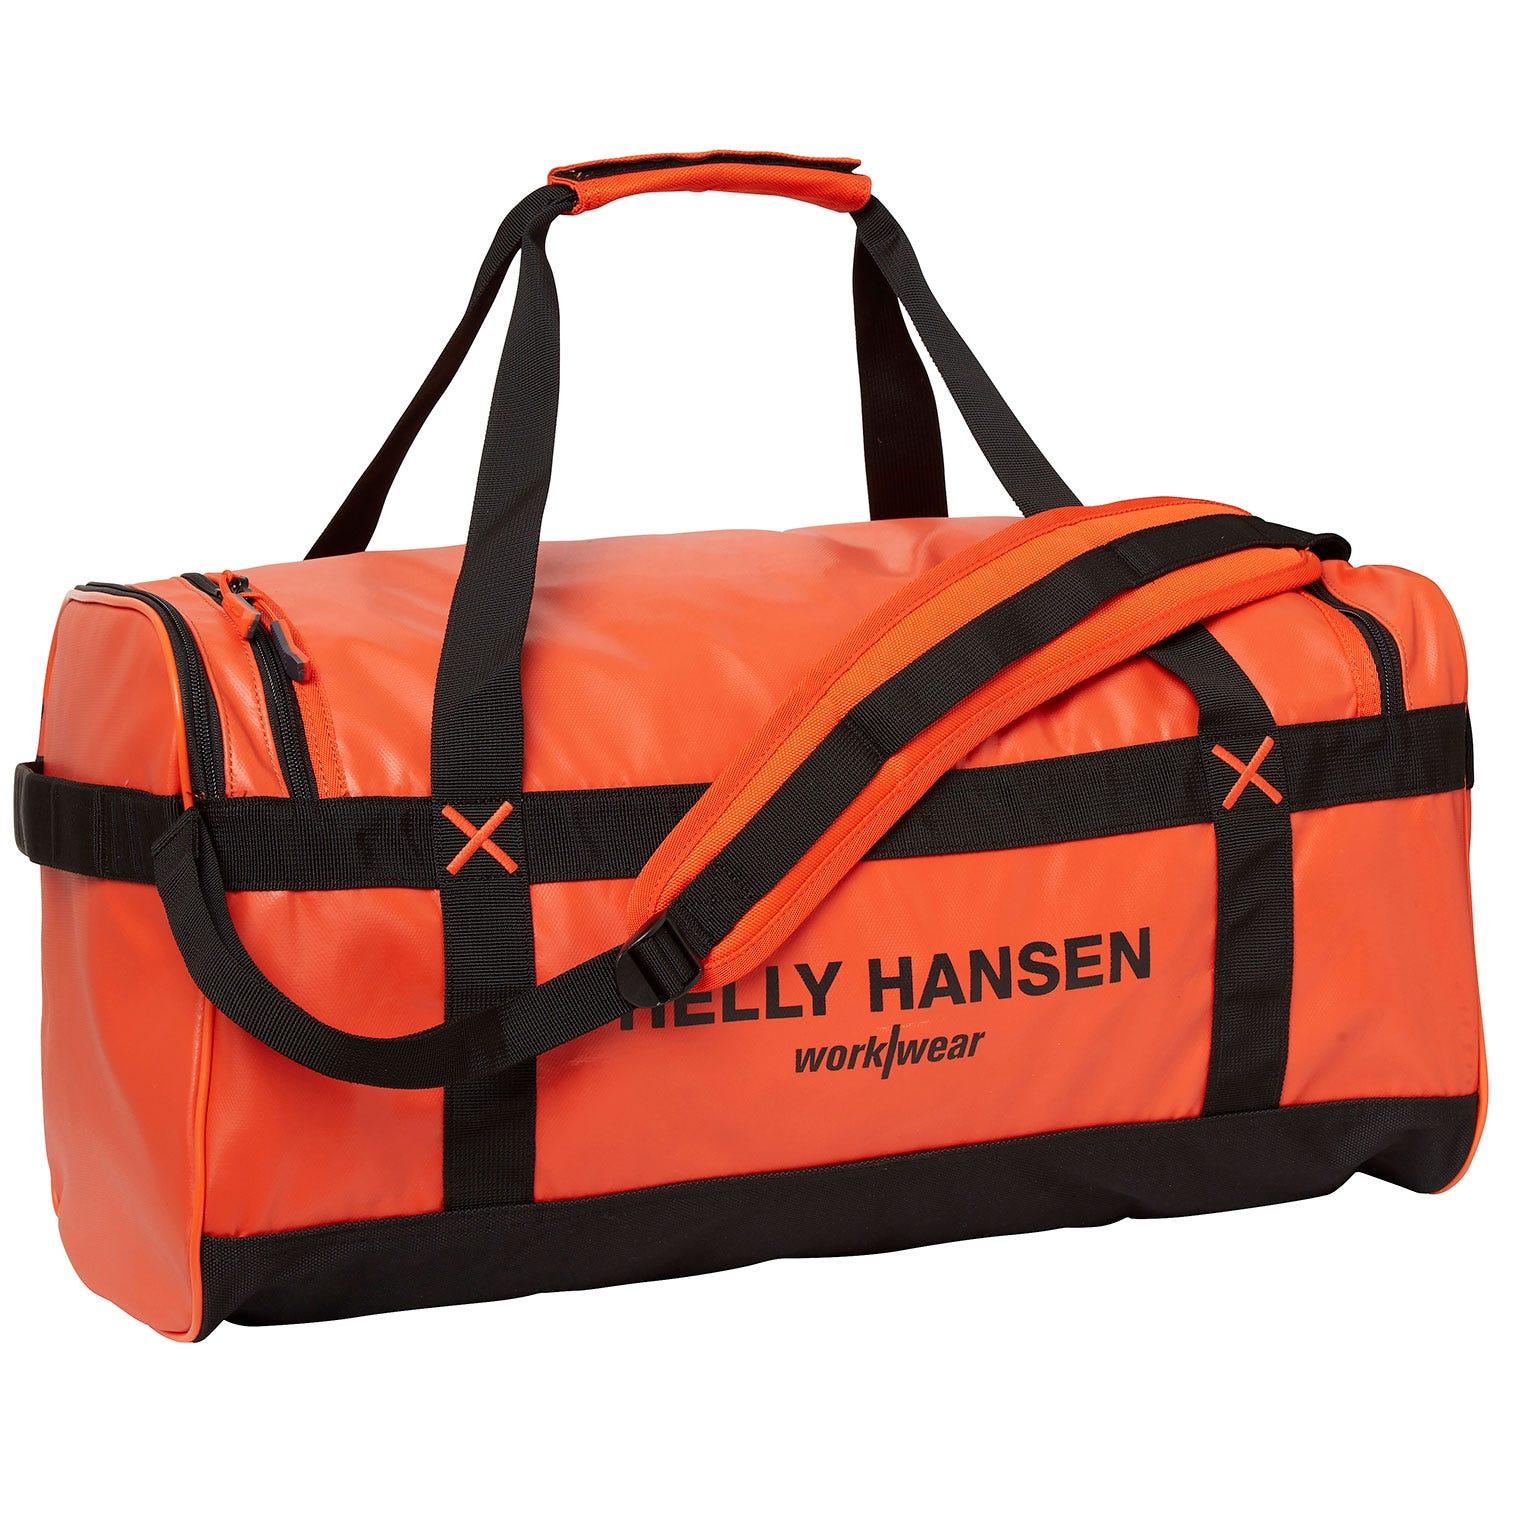 HH Workwear Workwear Helly Hansen Hh Borsone Da Lavoro 50l STD Arancione